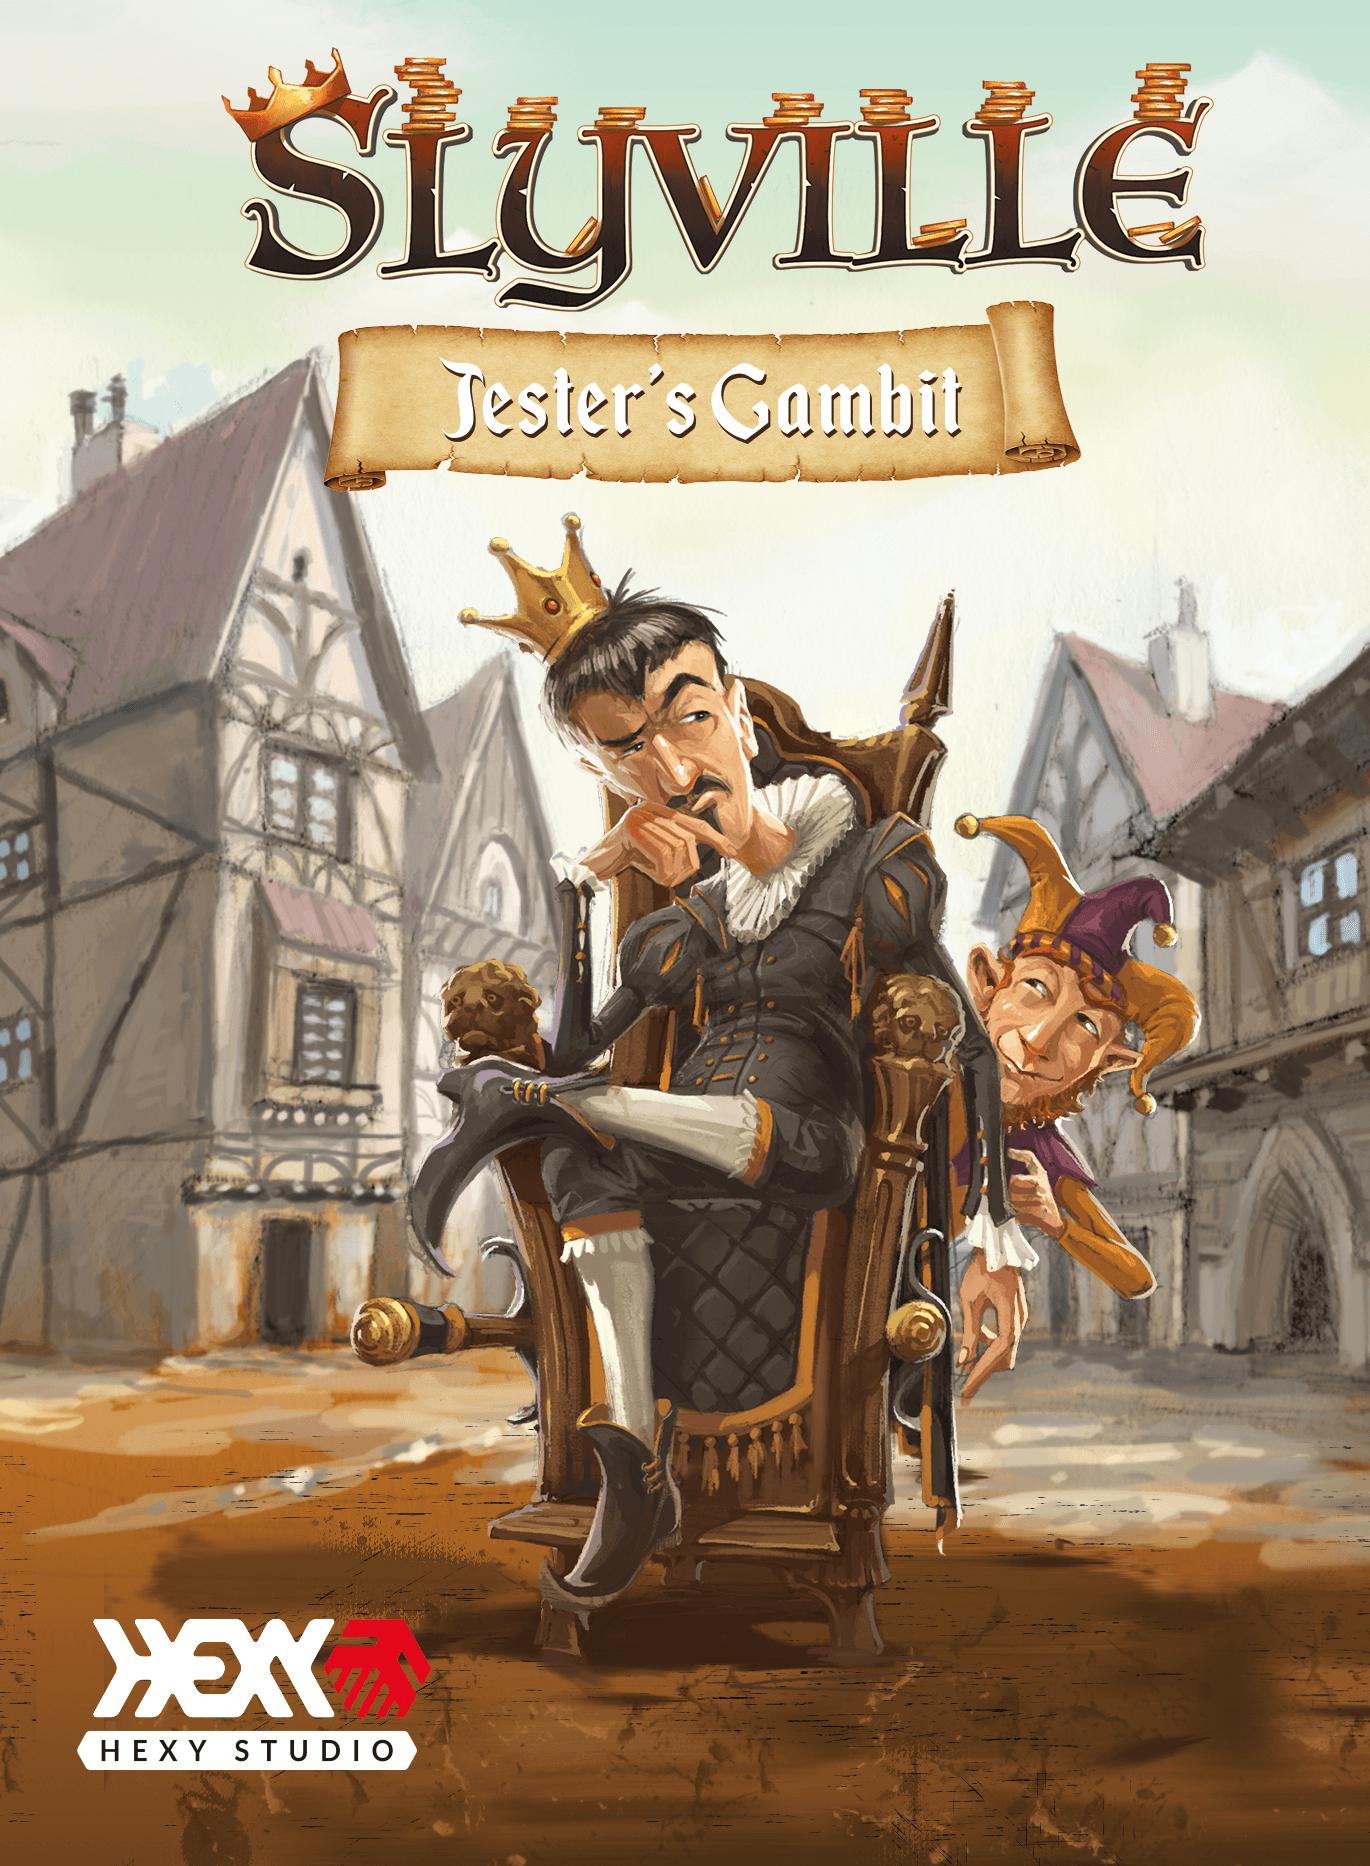 Slyville: Jester's Gambit